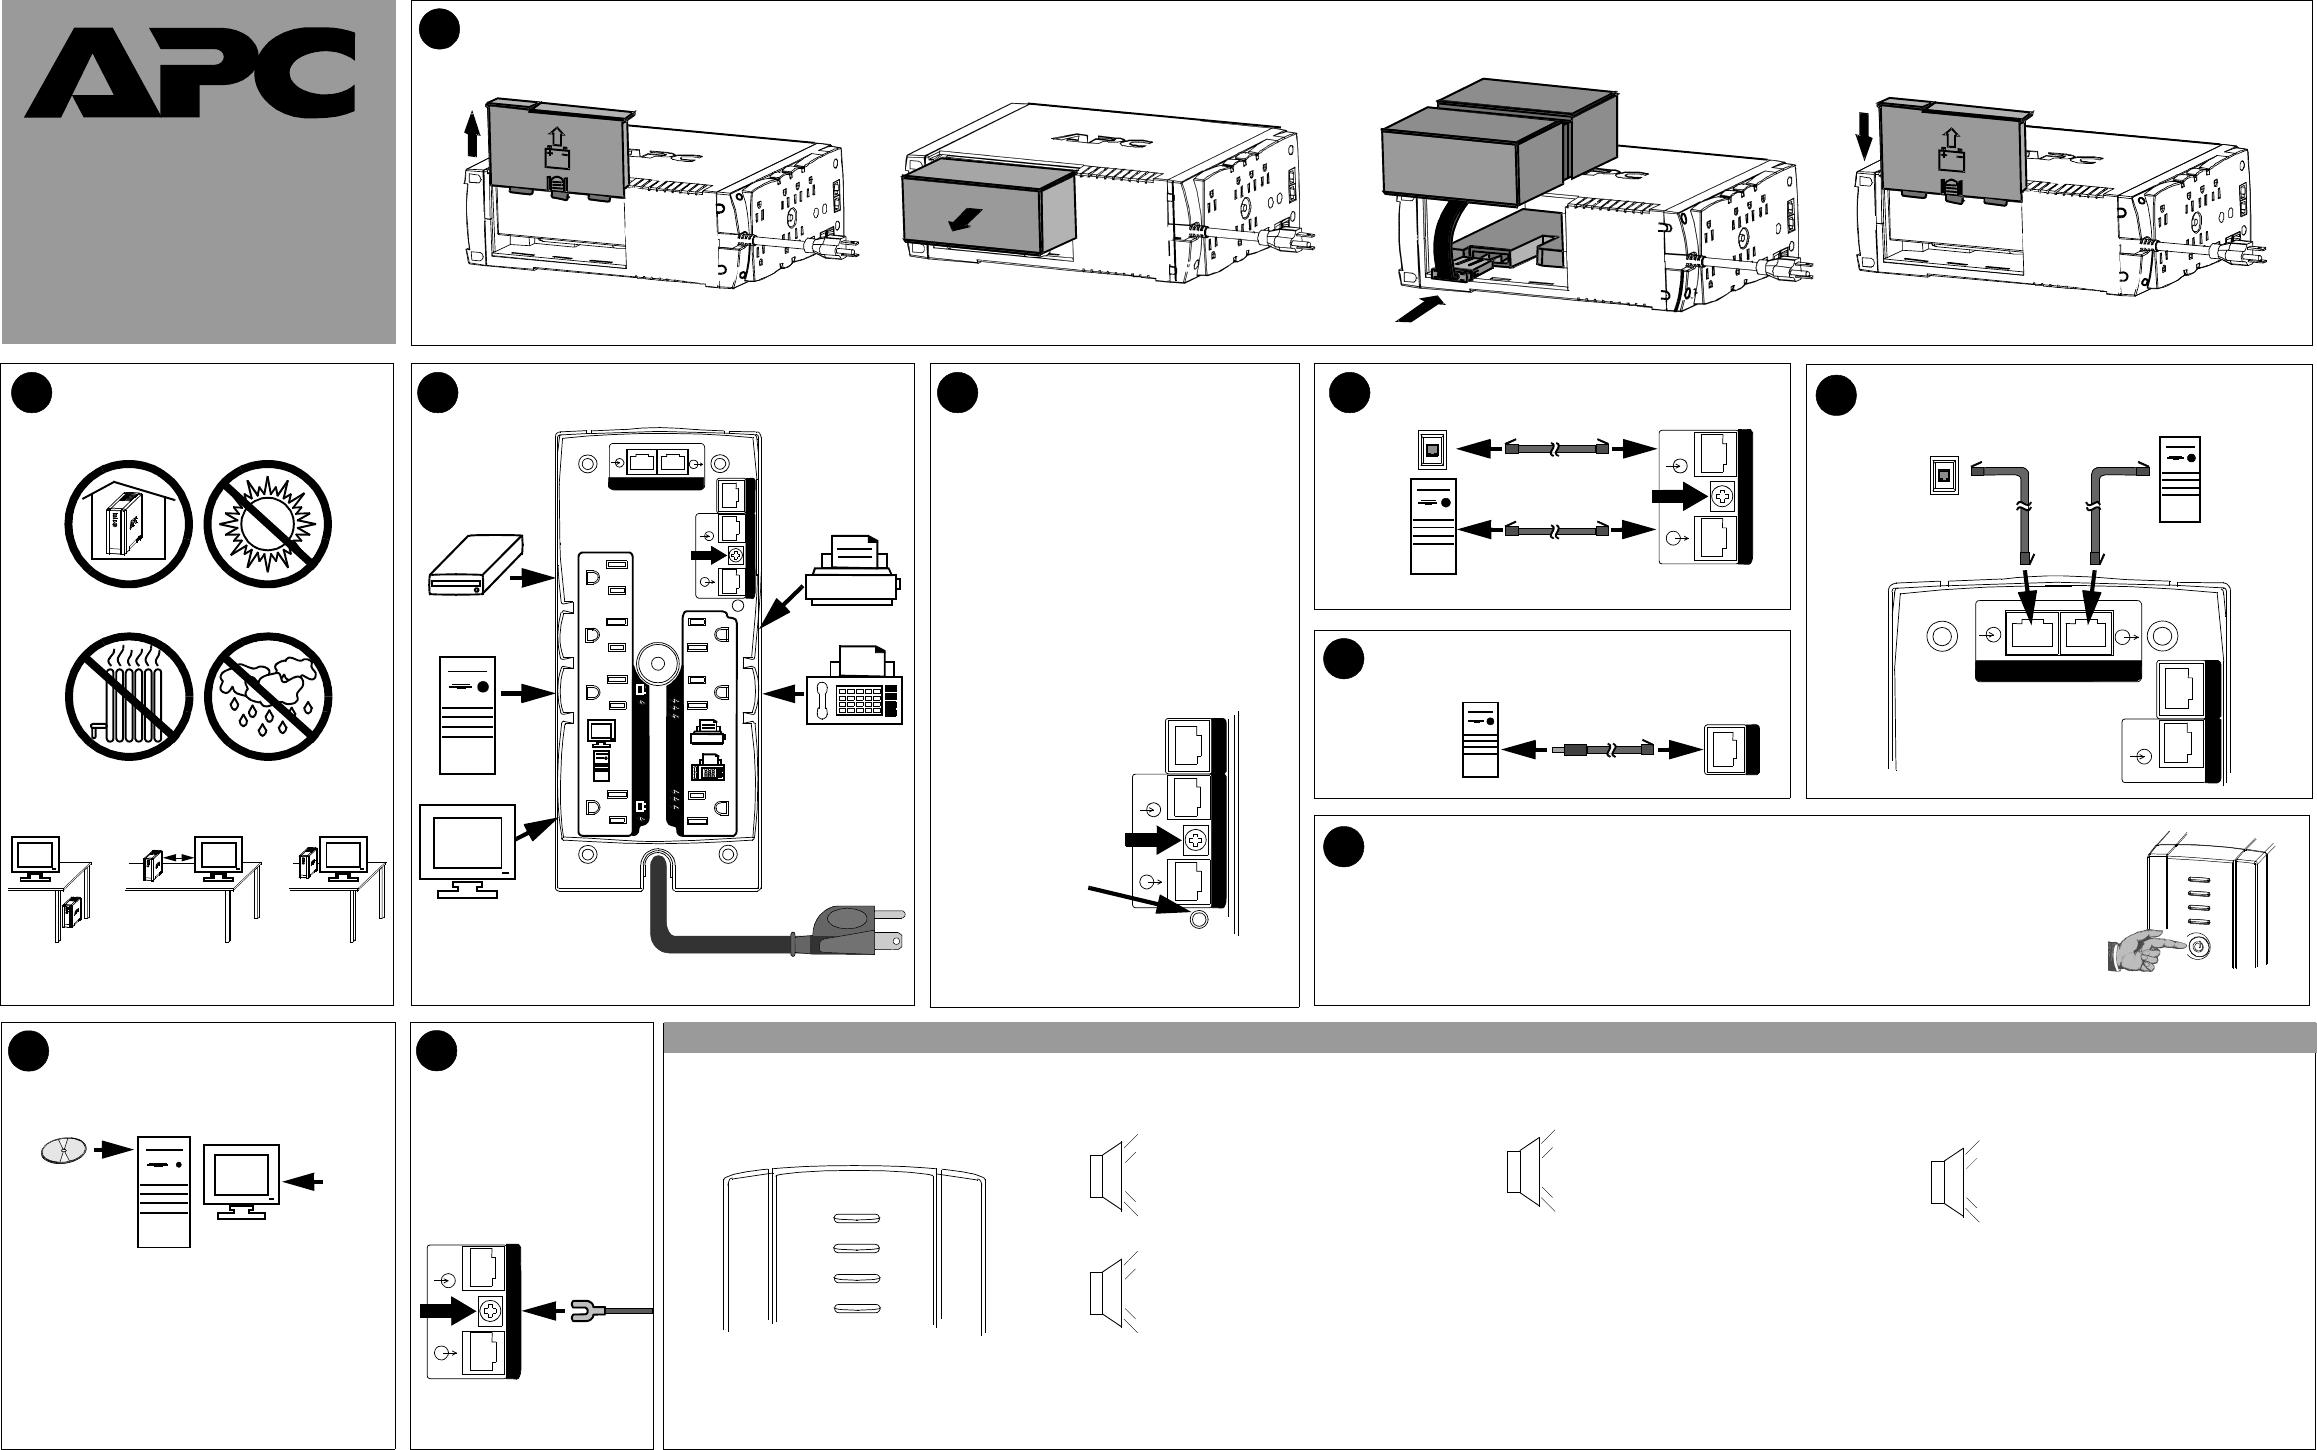 Apc Br900gi Rs 900 Xs User Manual Faxphone Wiring Diagram